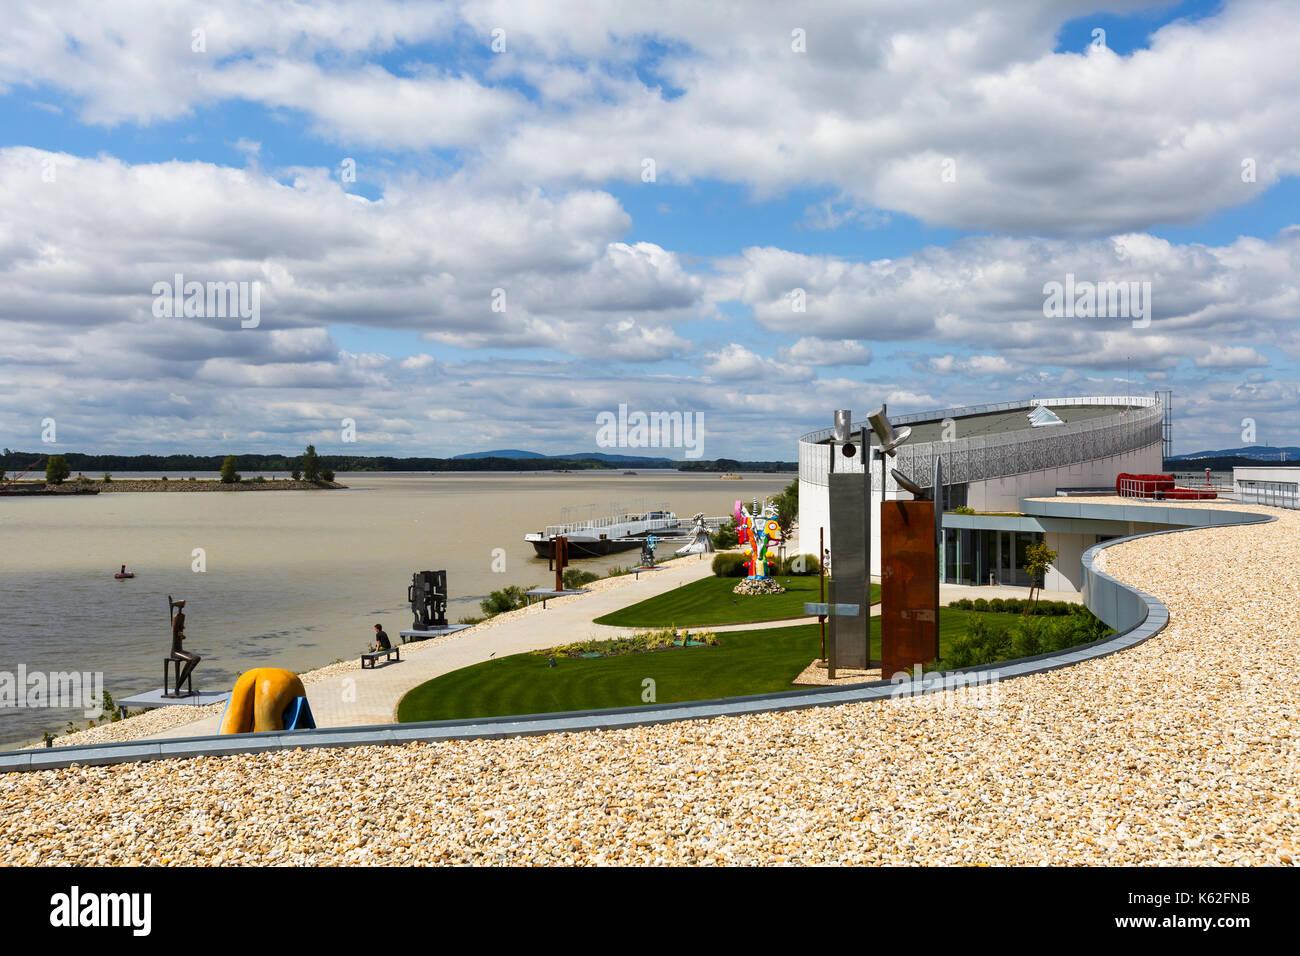 Outdoor exhibition spaces of Danubiana modern art gallery in Bratislava, Slovakia. - Stock Image